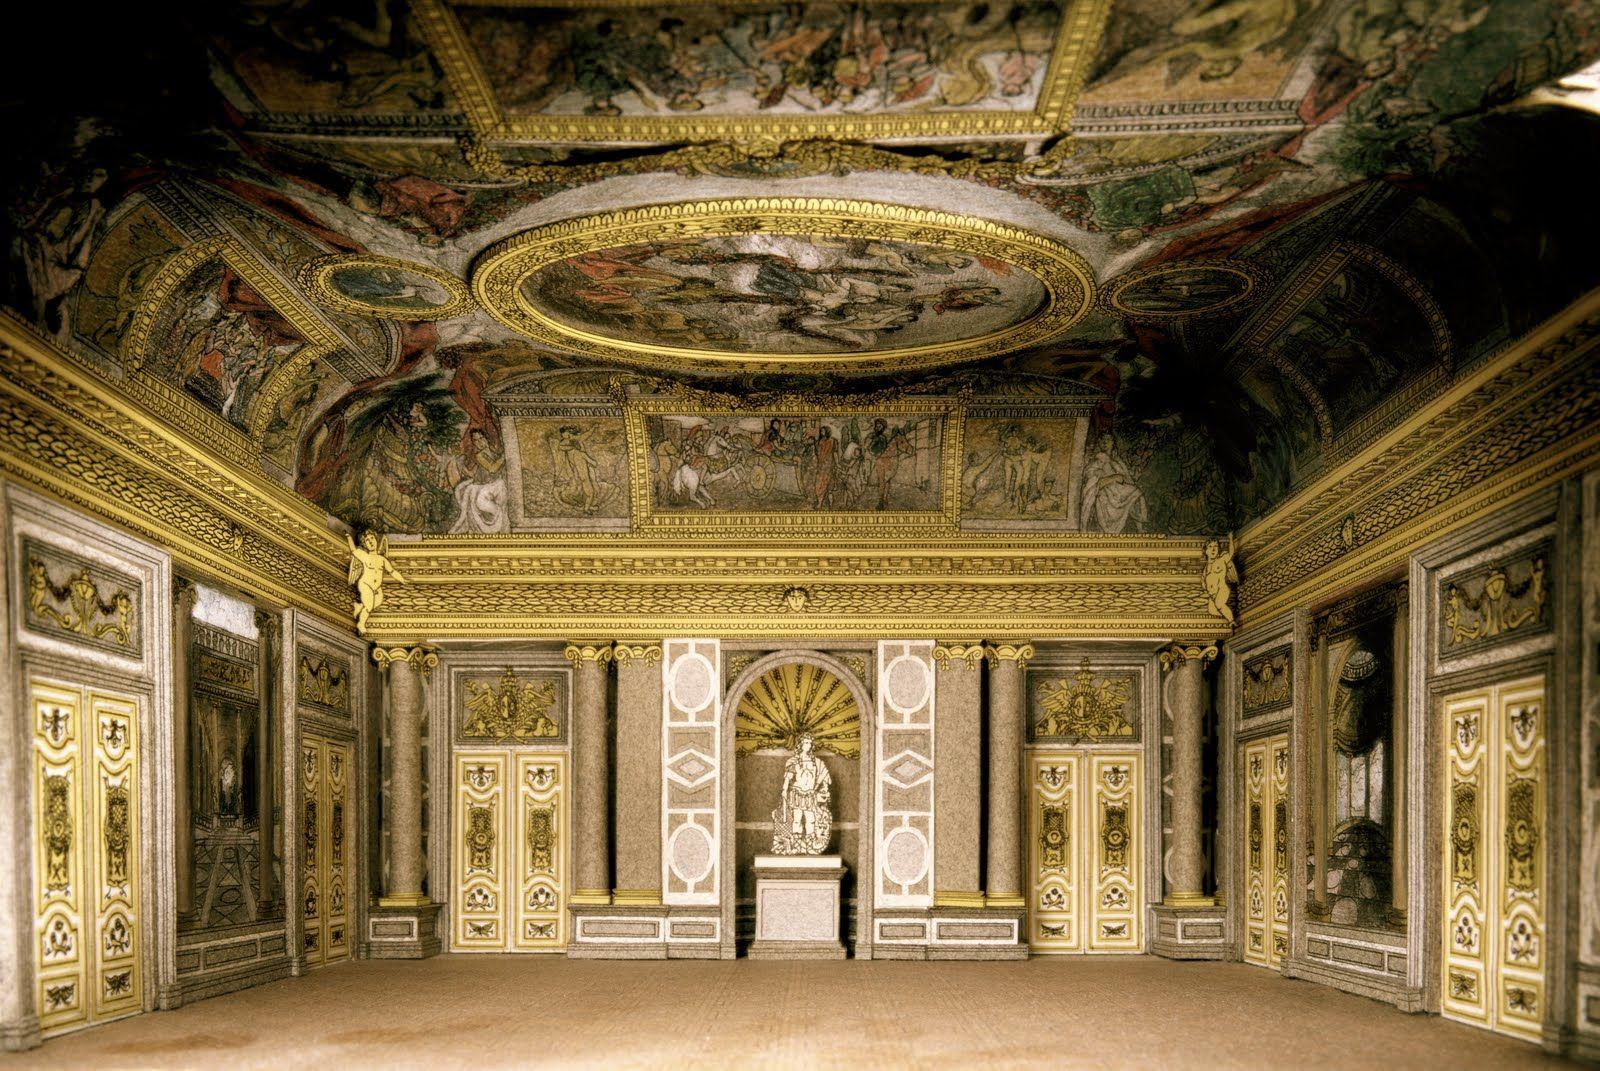 Inside versailles google search inside castles for Salon versailles